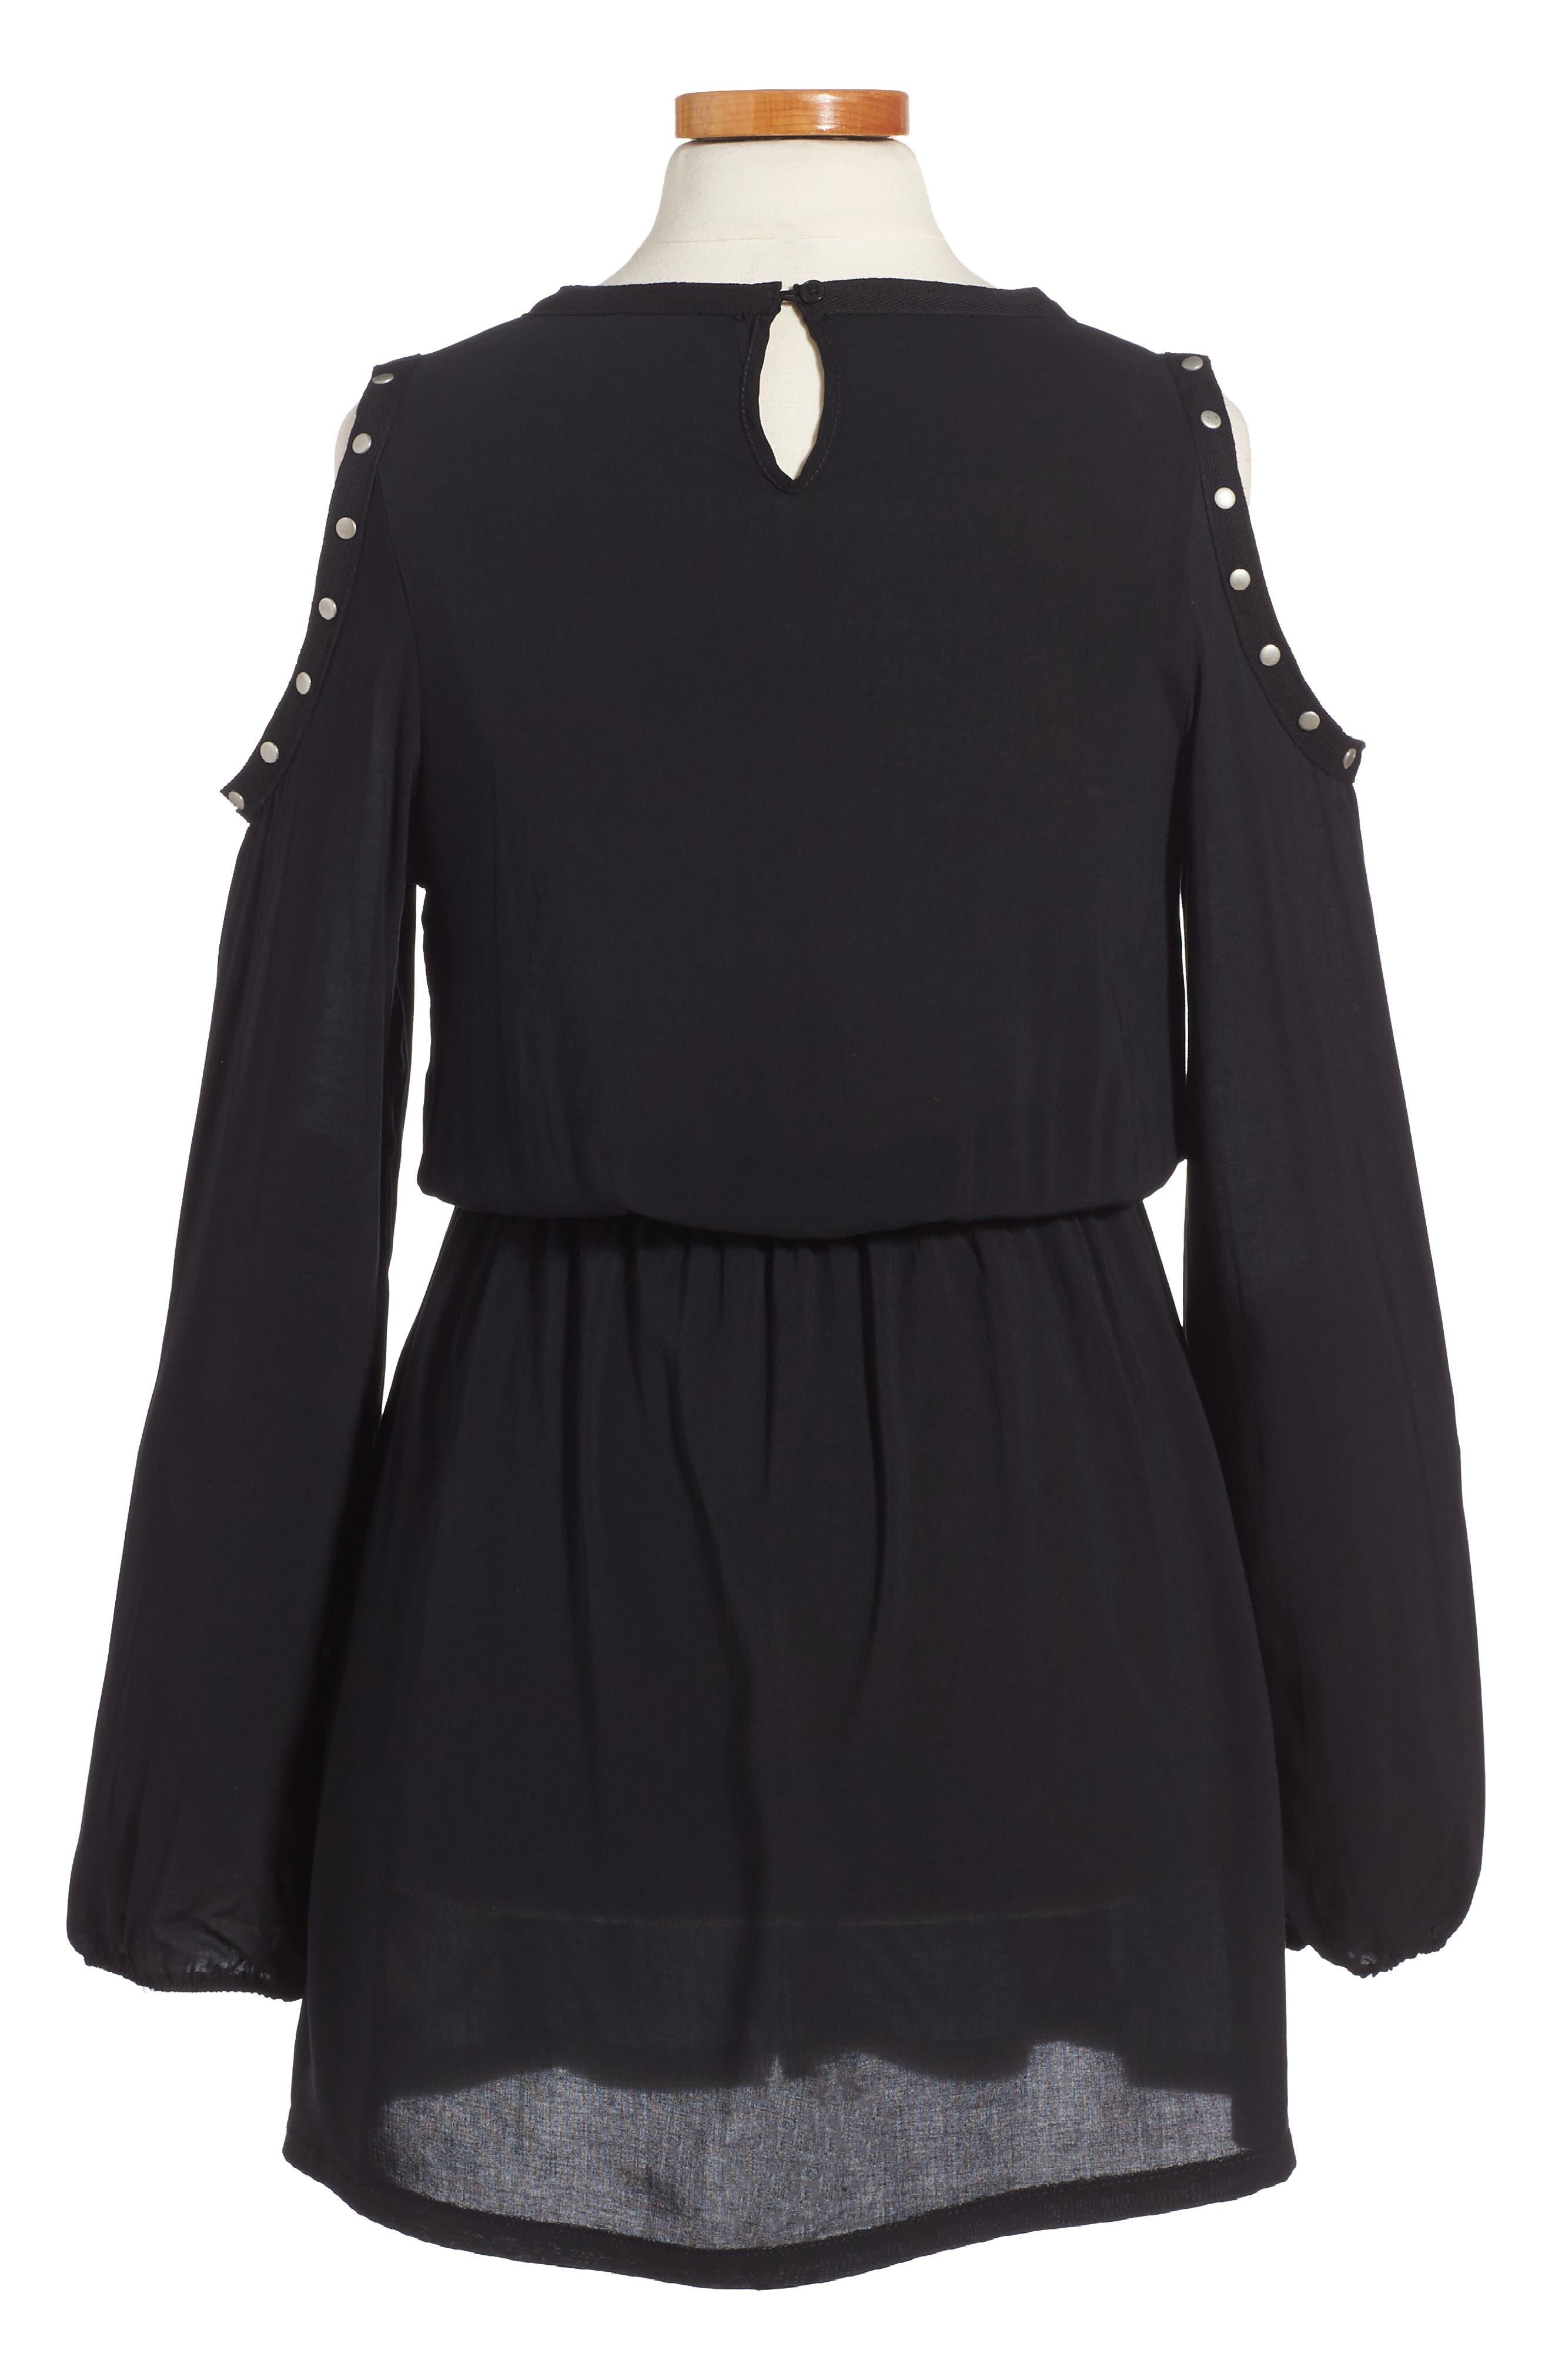 Grommet Cold Shoulder Dress,                             Alternate thumbnail 2, color,                             001